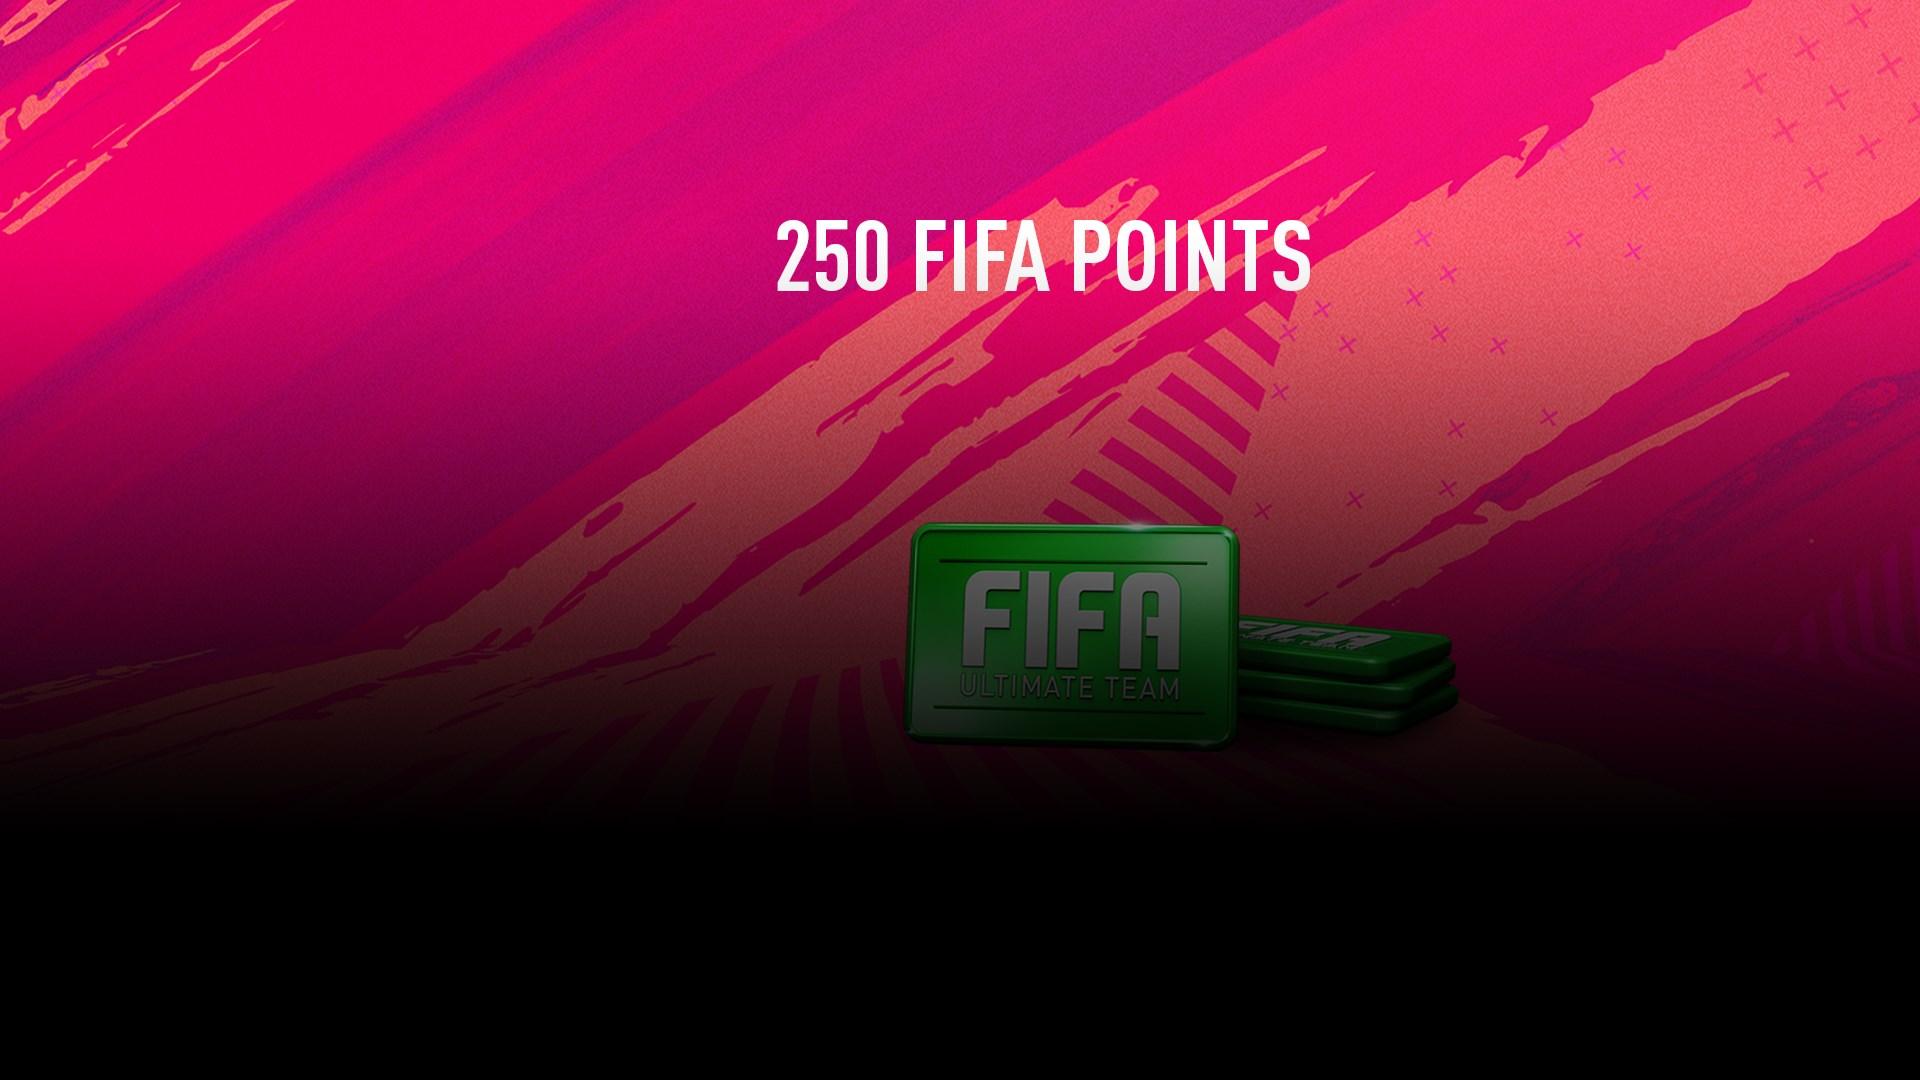 FIFA Points 250